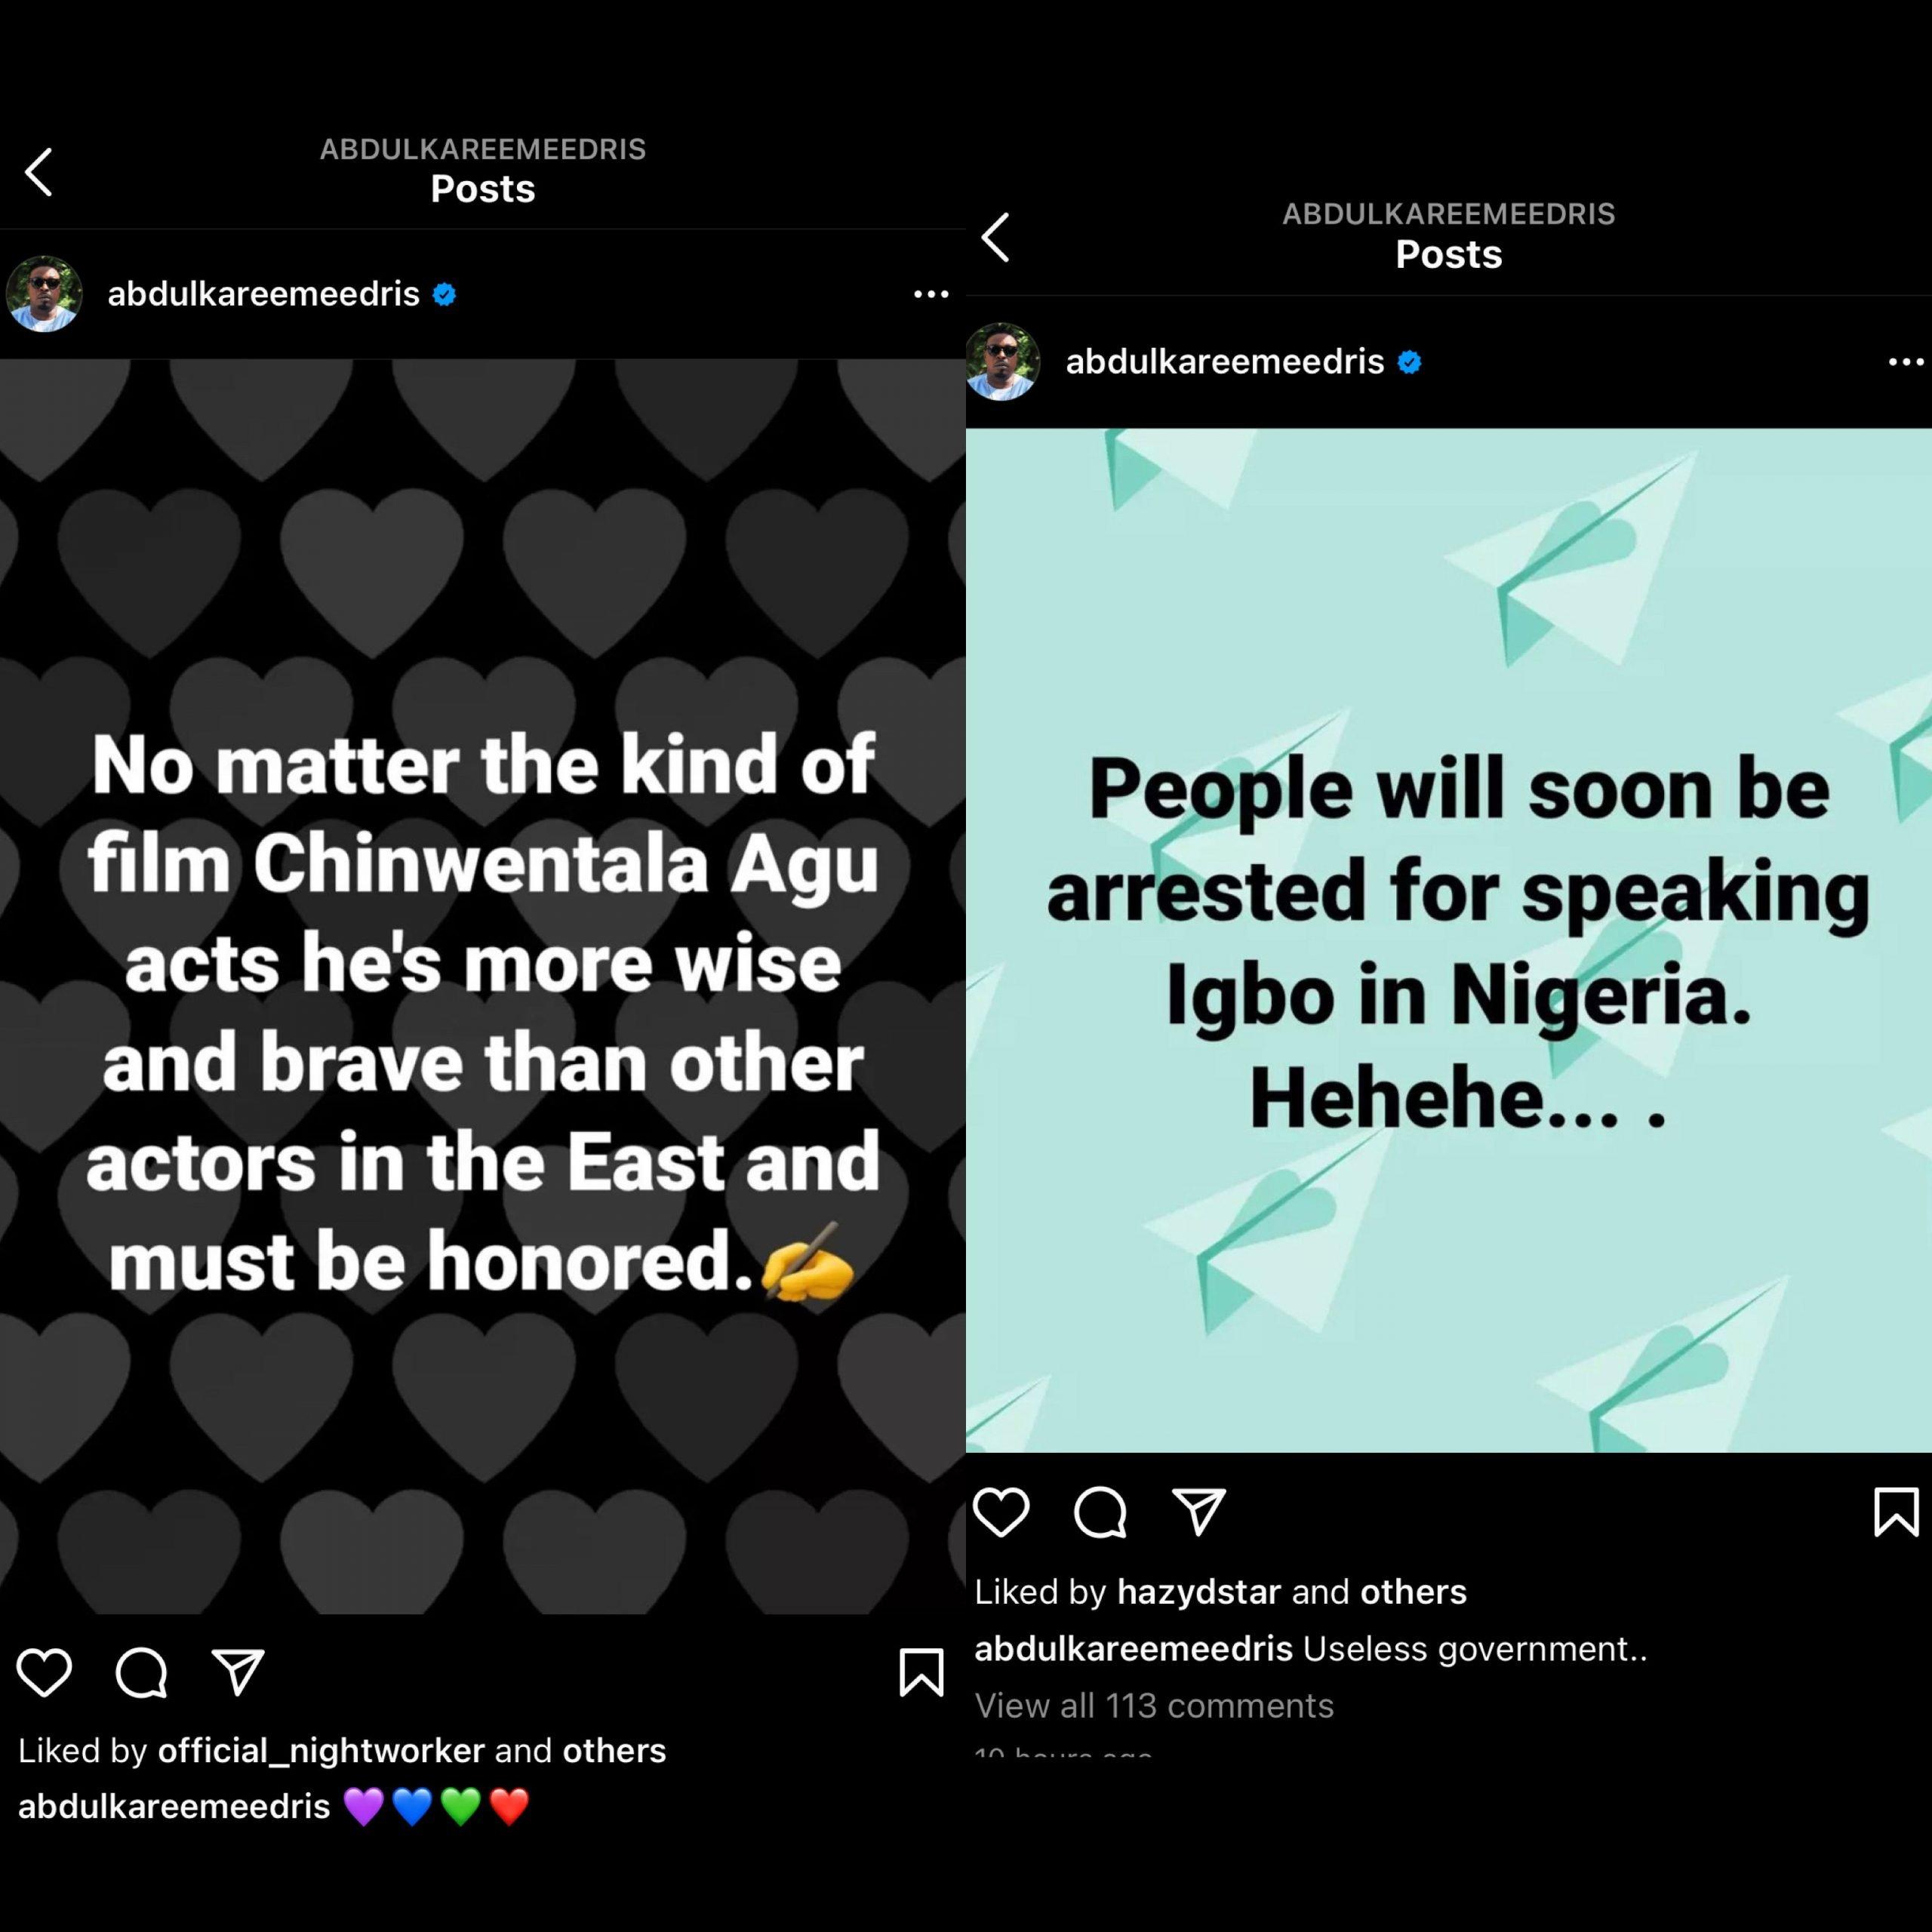 People Will Soon Be Arrested For Speaking Igbo In Nigeria – Eedris Abdulkareem